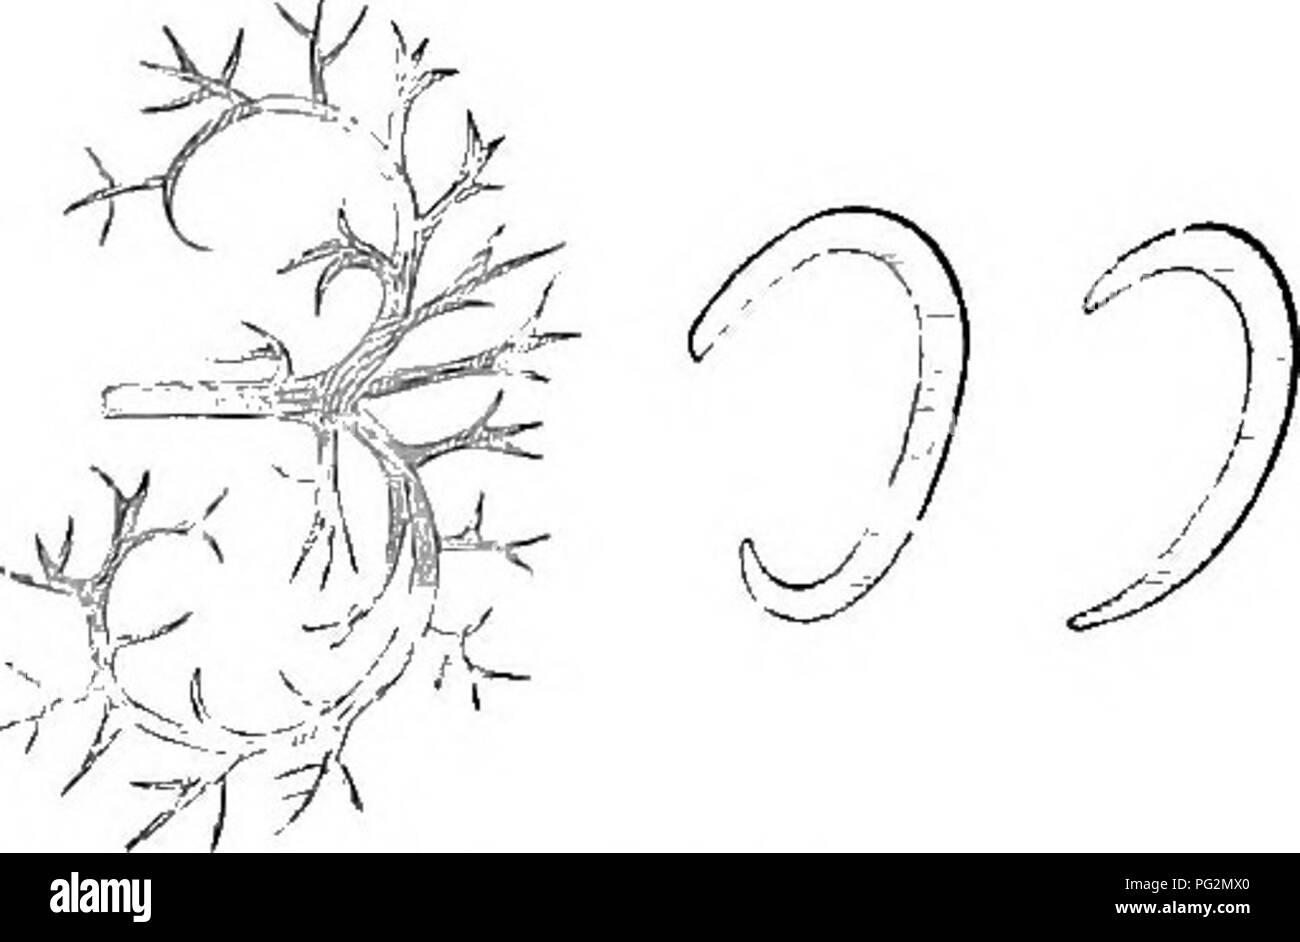 Elements Of The Comparative Anatomy Of Vertebrates Anatomy